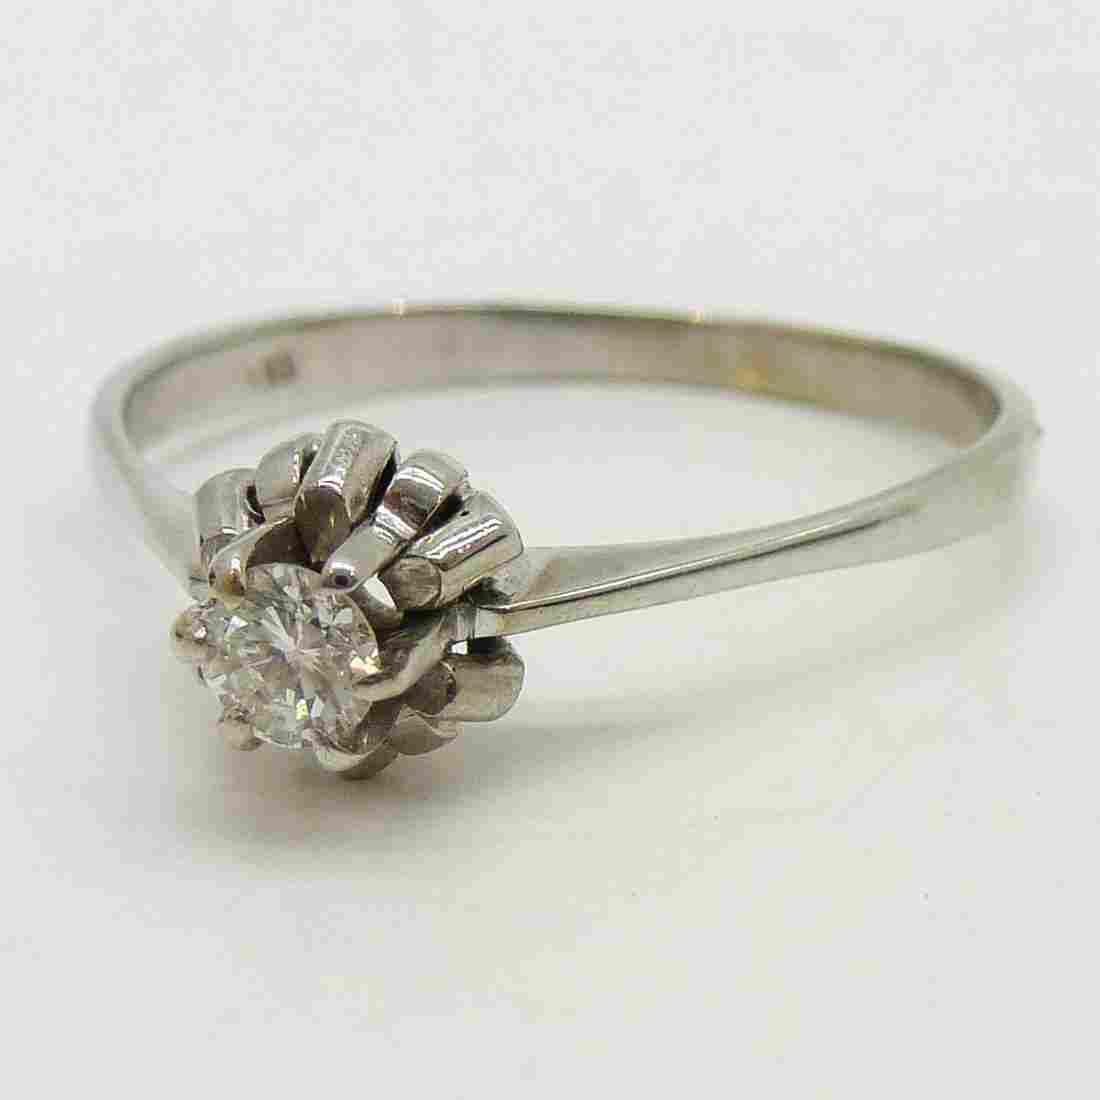 14KWG Ladies Diamond Solitaire Ring